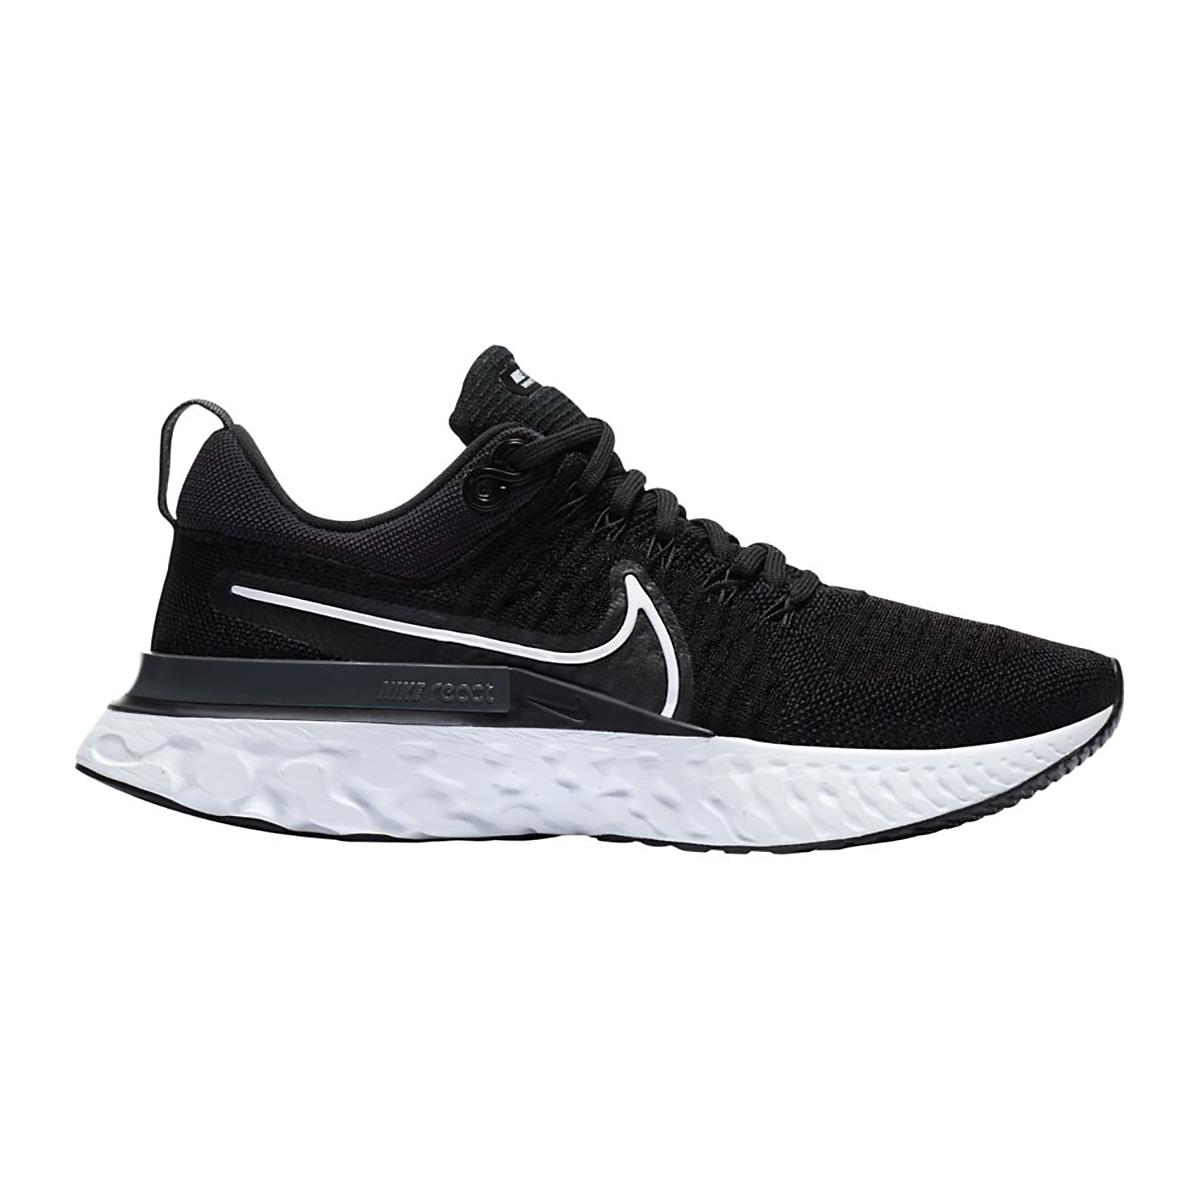 Women's Nike React Infinity Run Flyknit 2 Running Shoe - Color: Black/White/Iron Grey - Size: 5 - Width: Regular, Black/White/Iron Grey, large, image 1